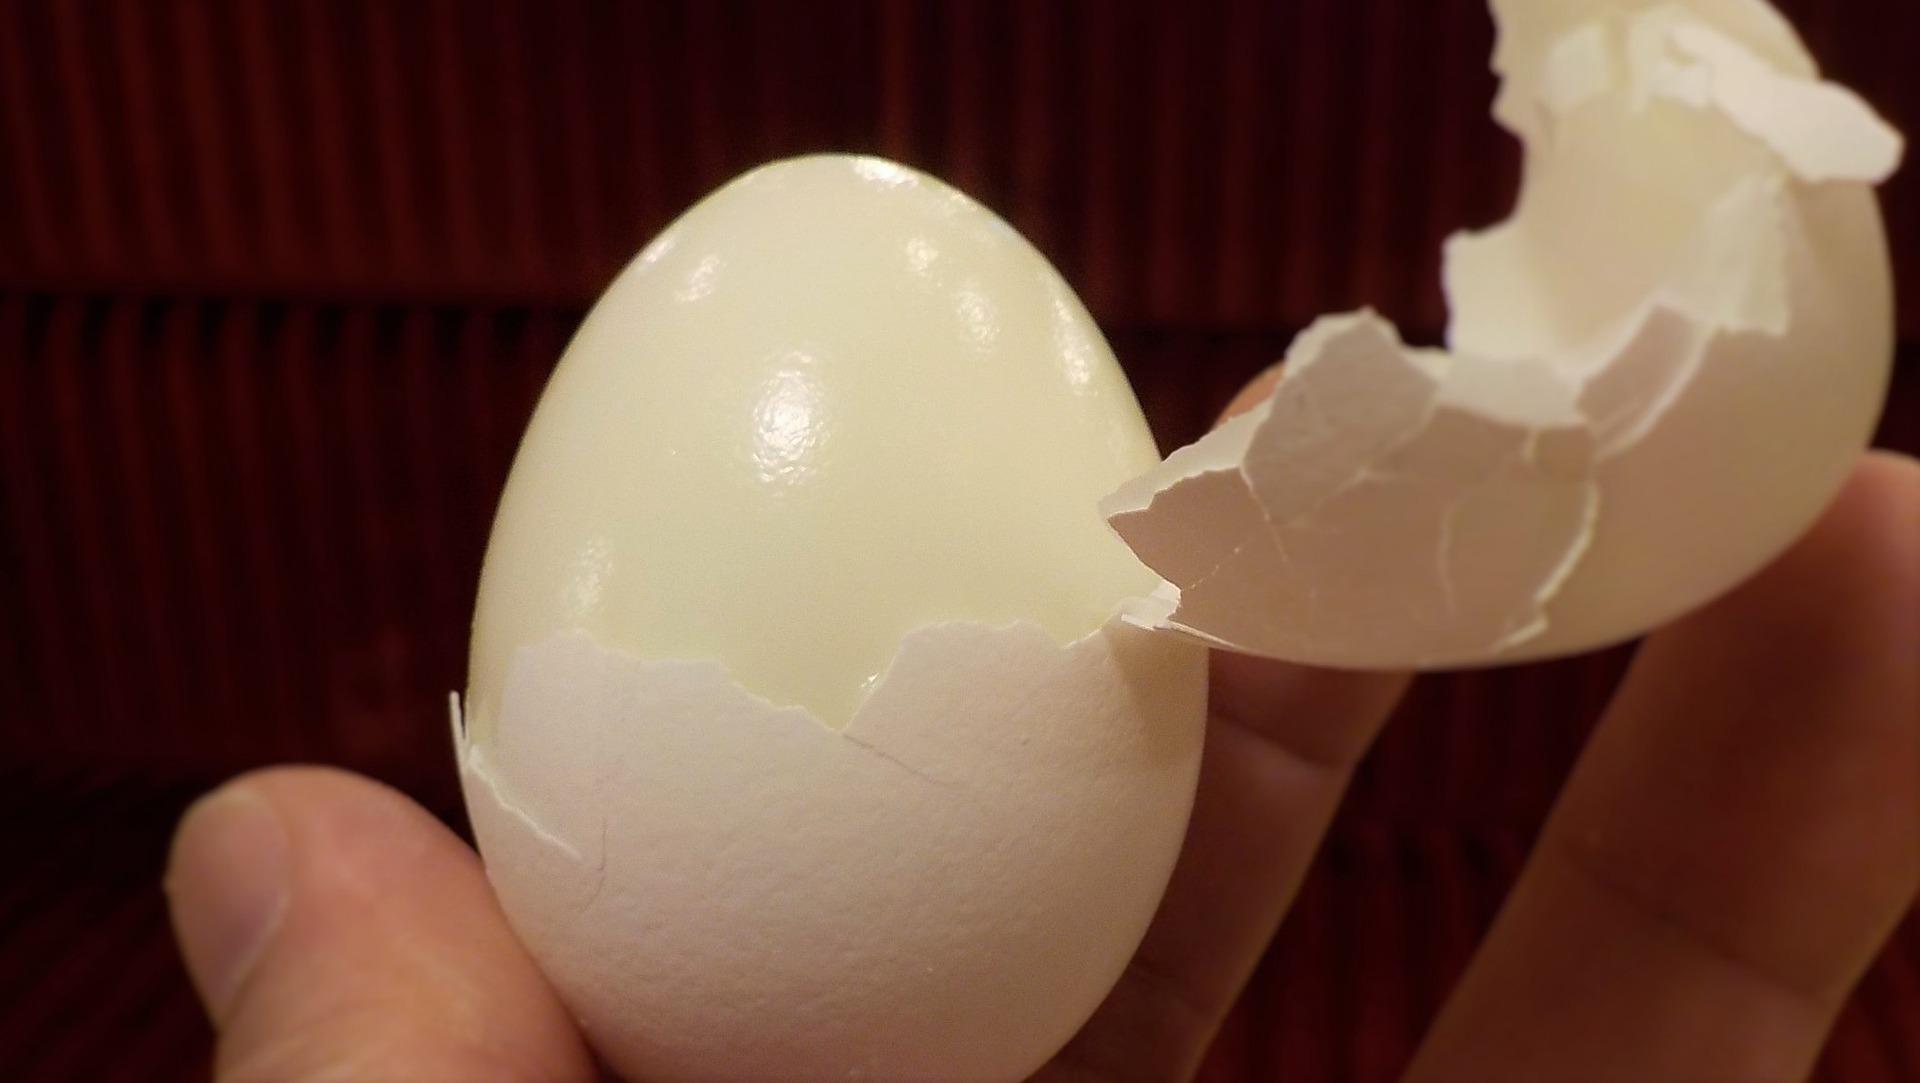 Egg membrane is a powerful anti-inflammatory